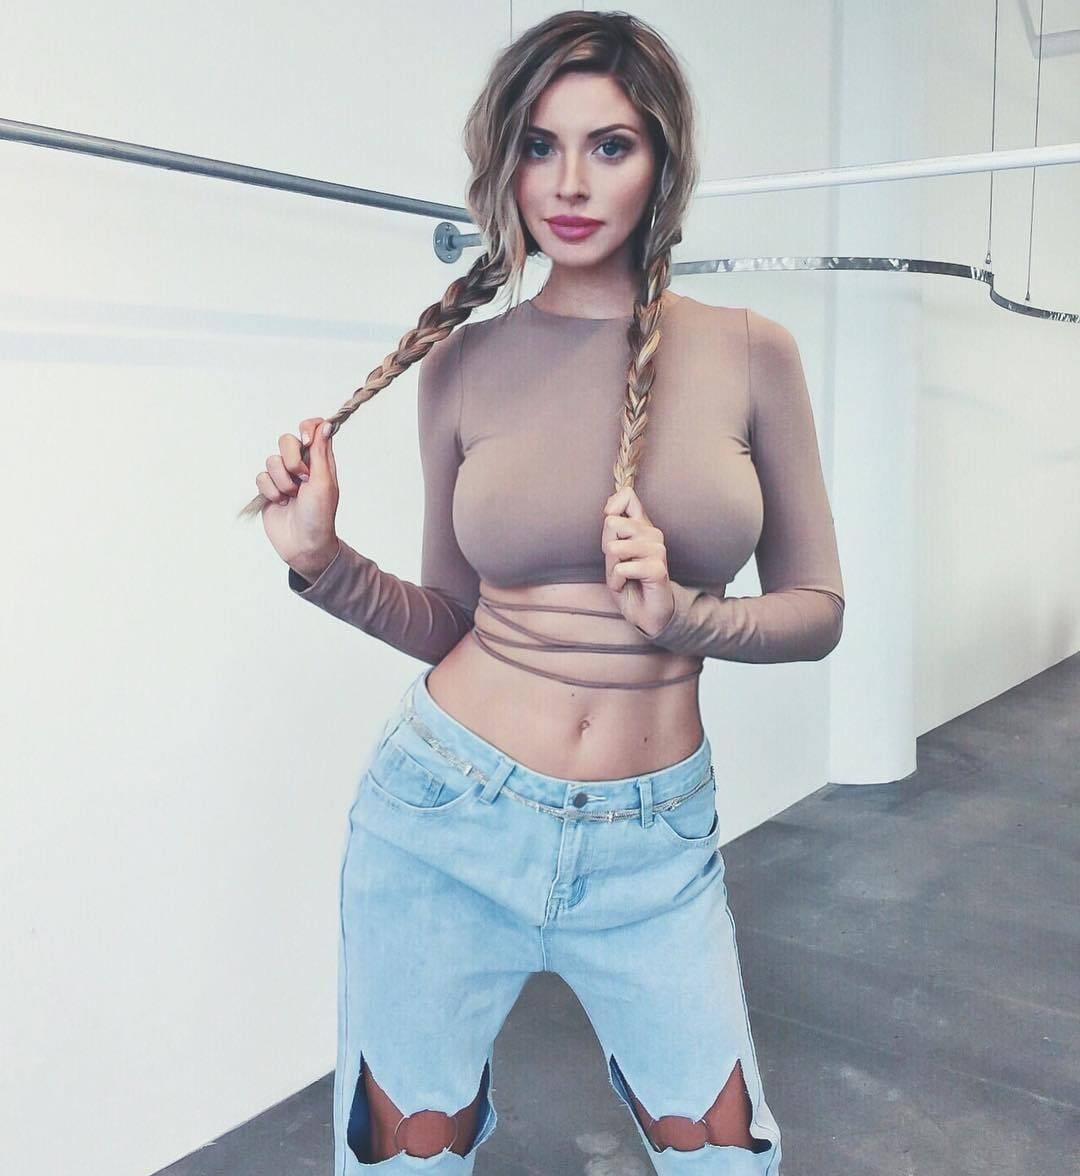 ICloud Ashley Schultz nude (68 pics), Feet